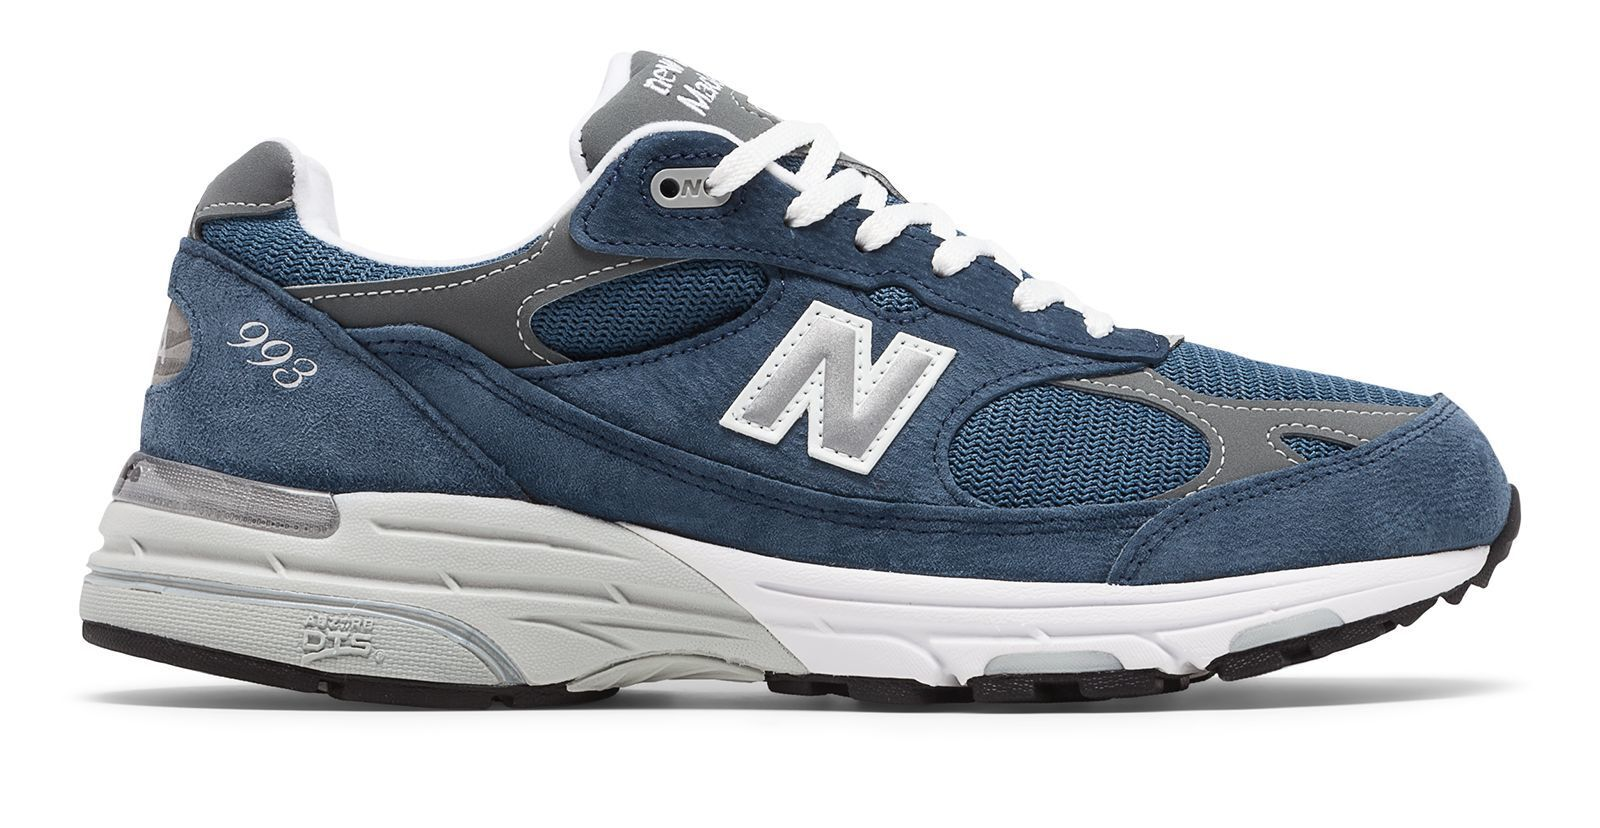 New Balance Men's Classic 993 Running Shoes Blue